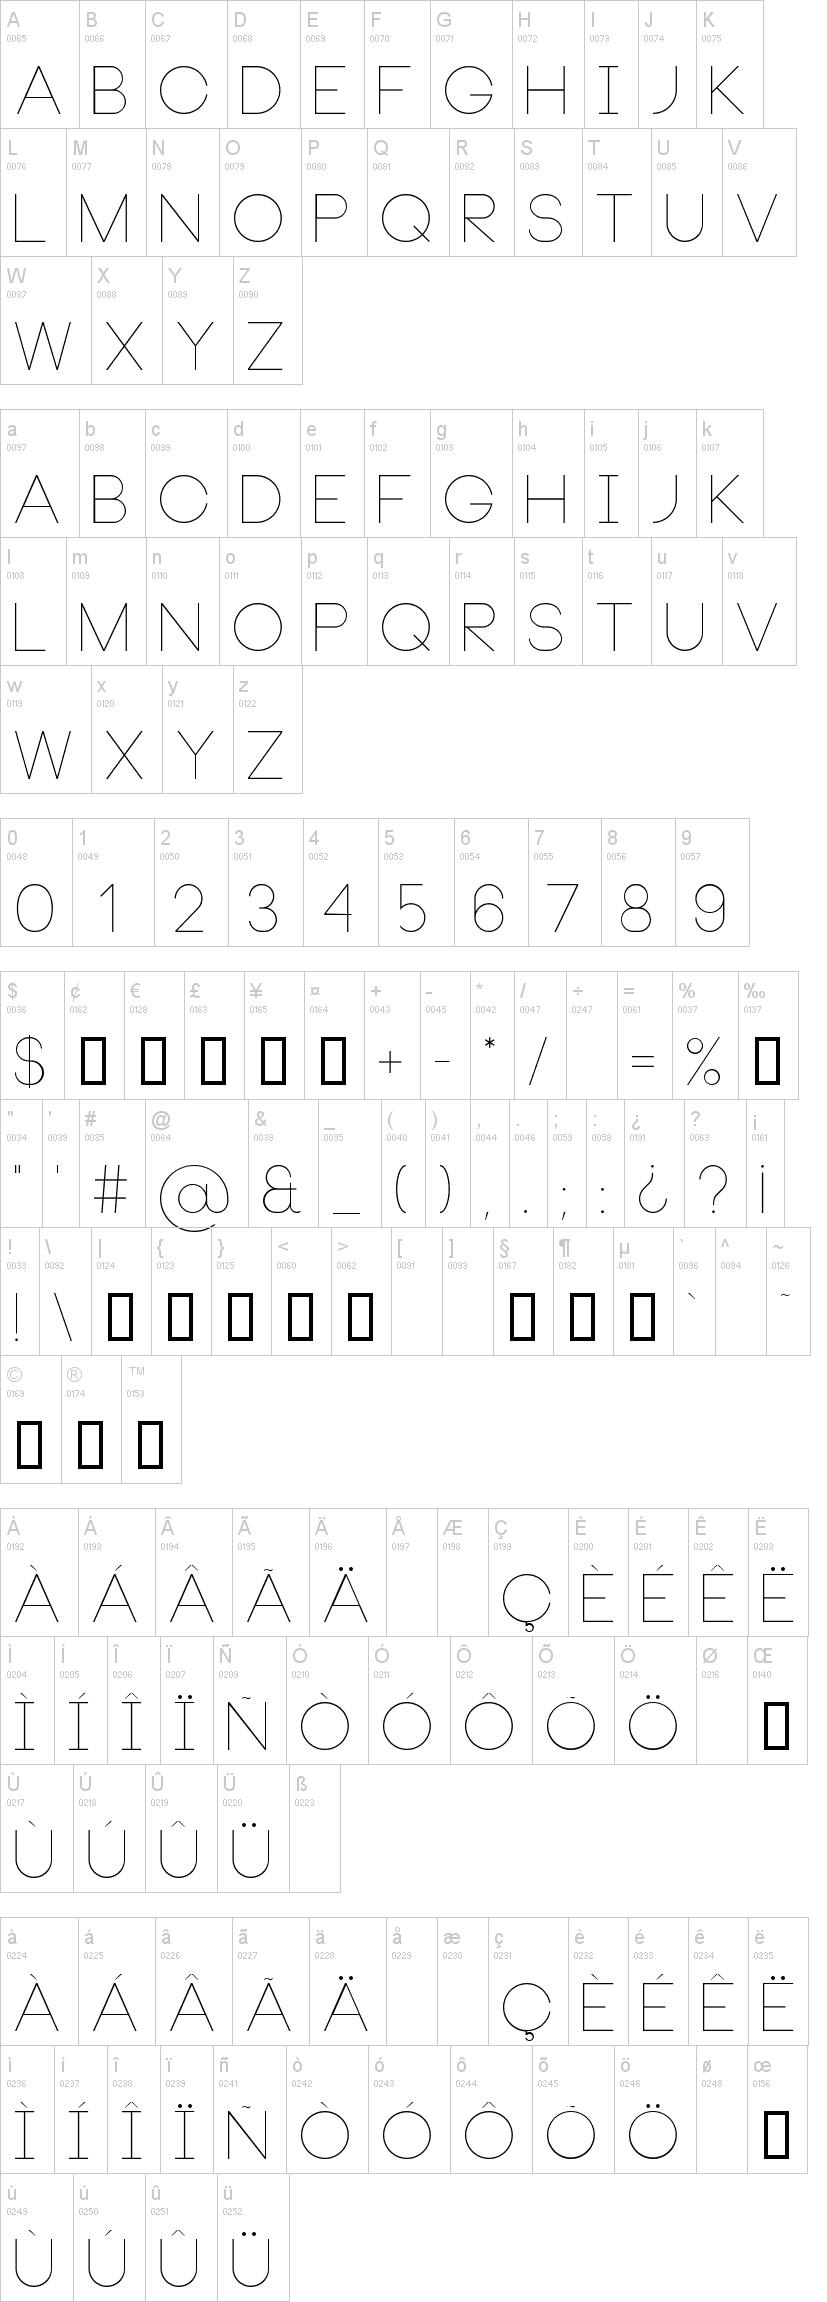 Neou Font | dafont com | fonts | Hand lettering fonts, Fonts